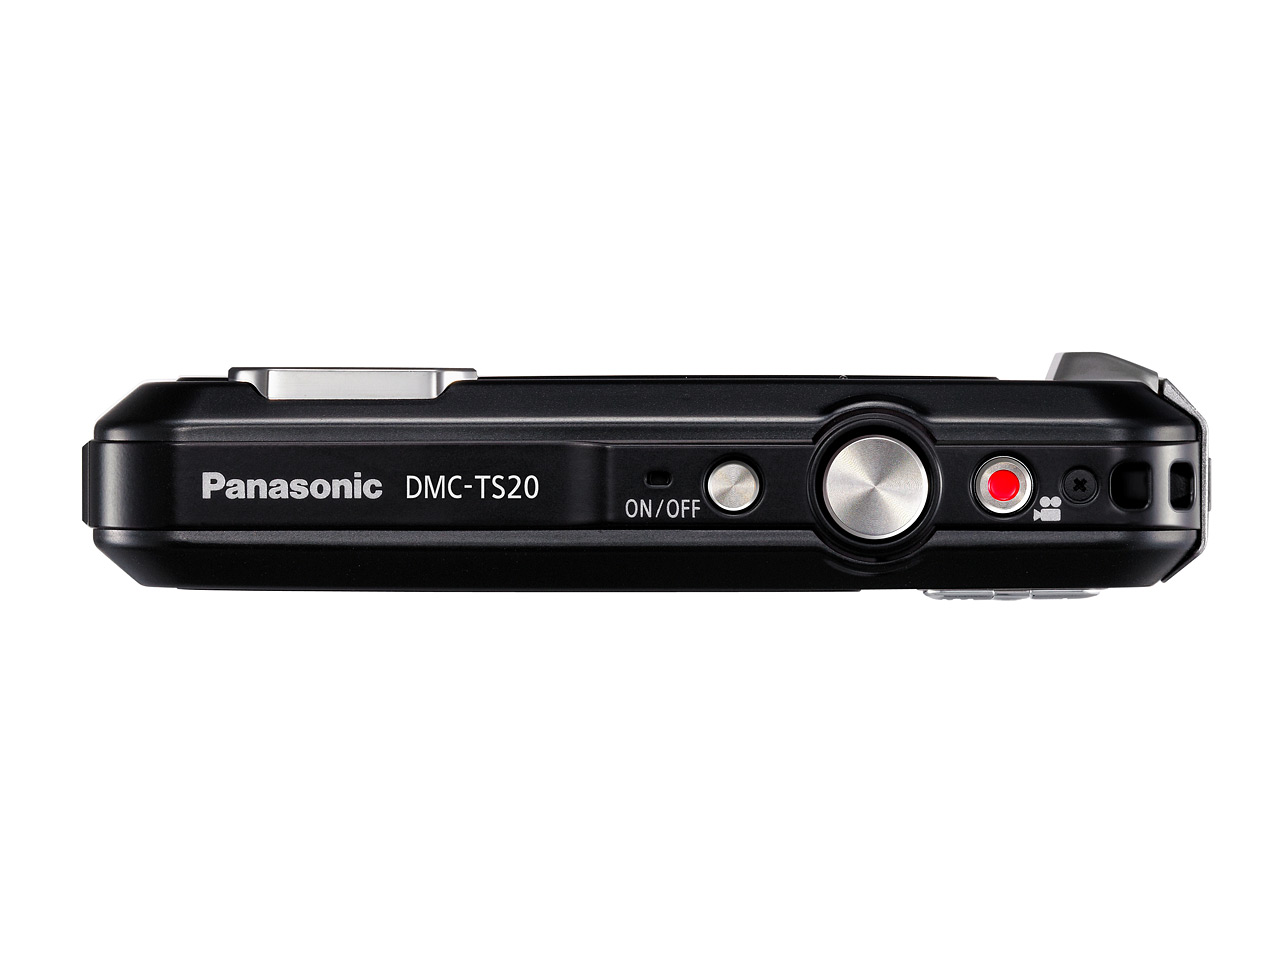 Panasonic makes DMC-TS20 semi-rugged compact camera: Digital